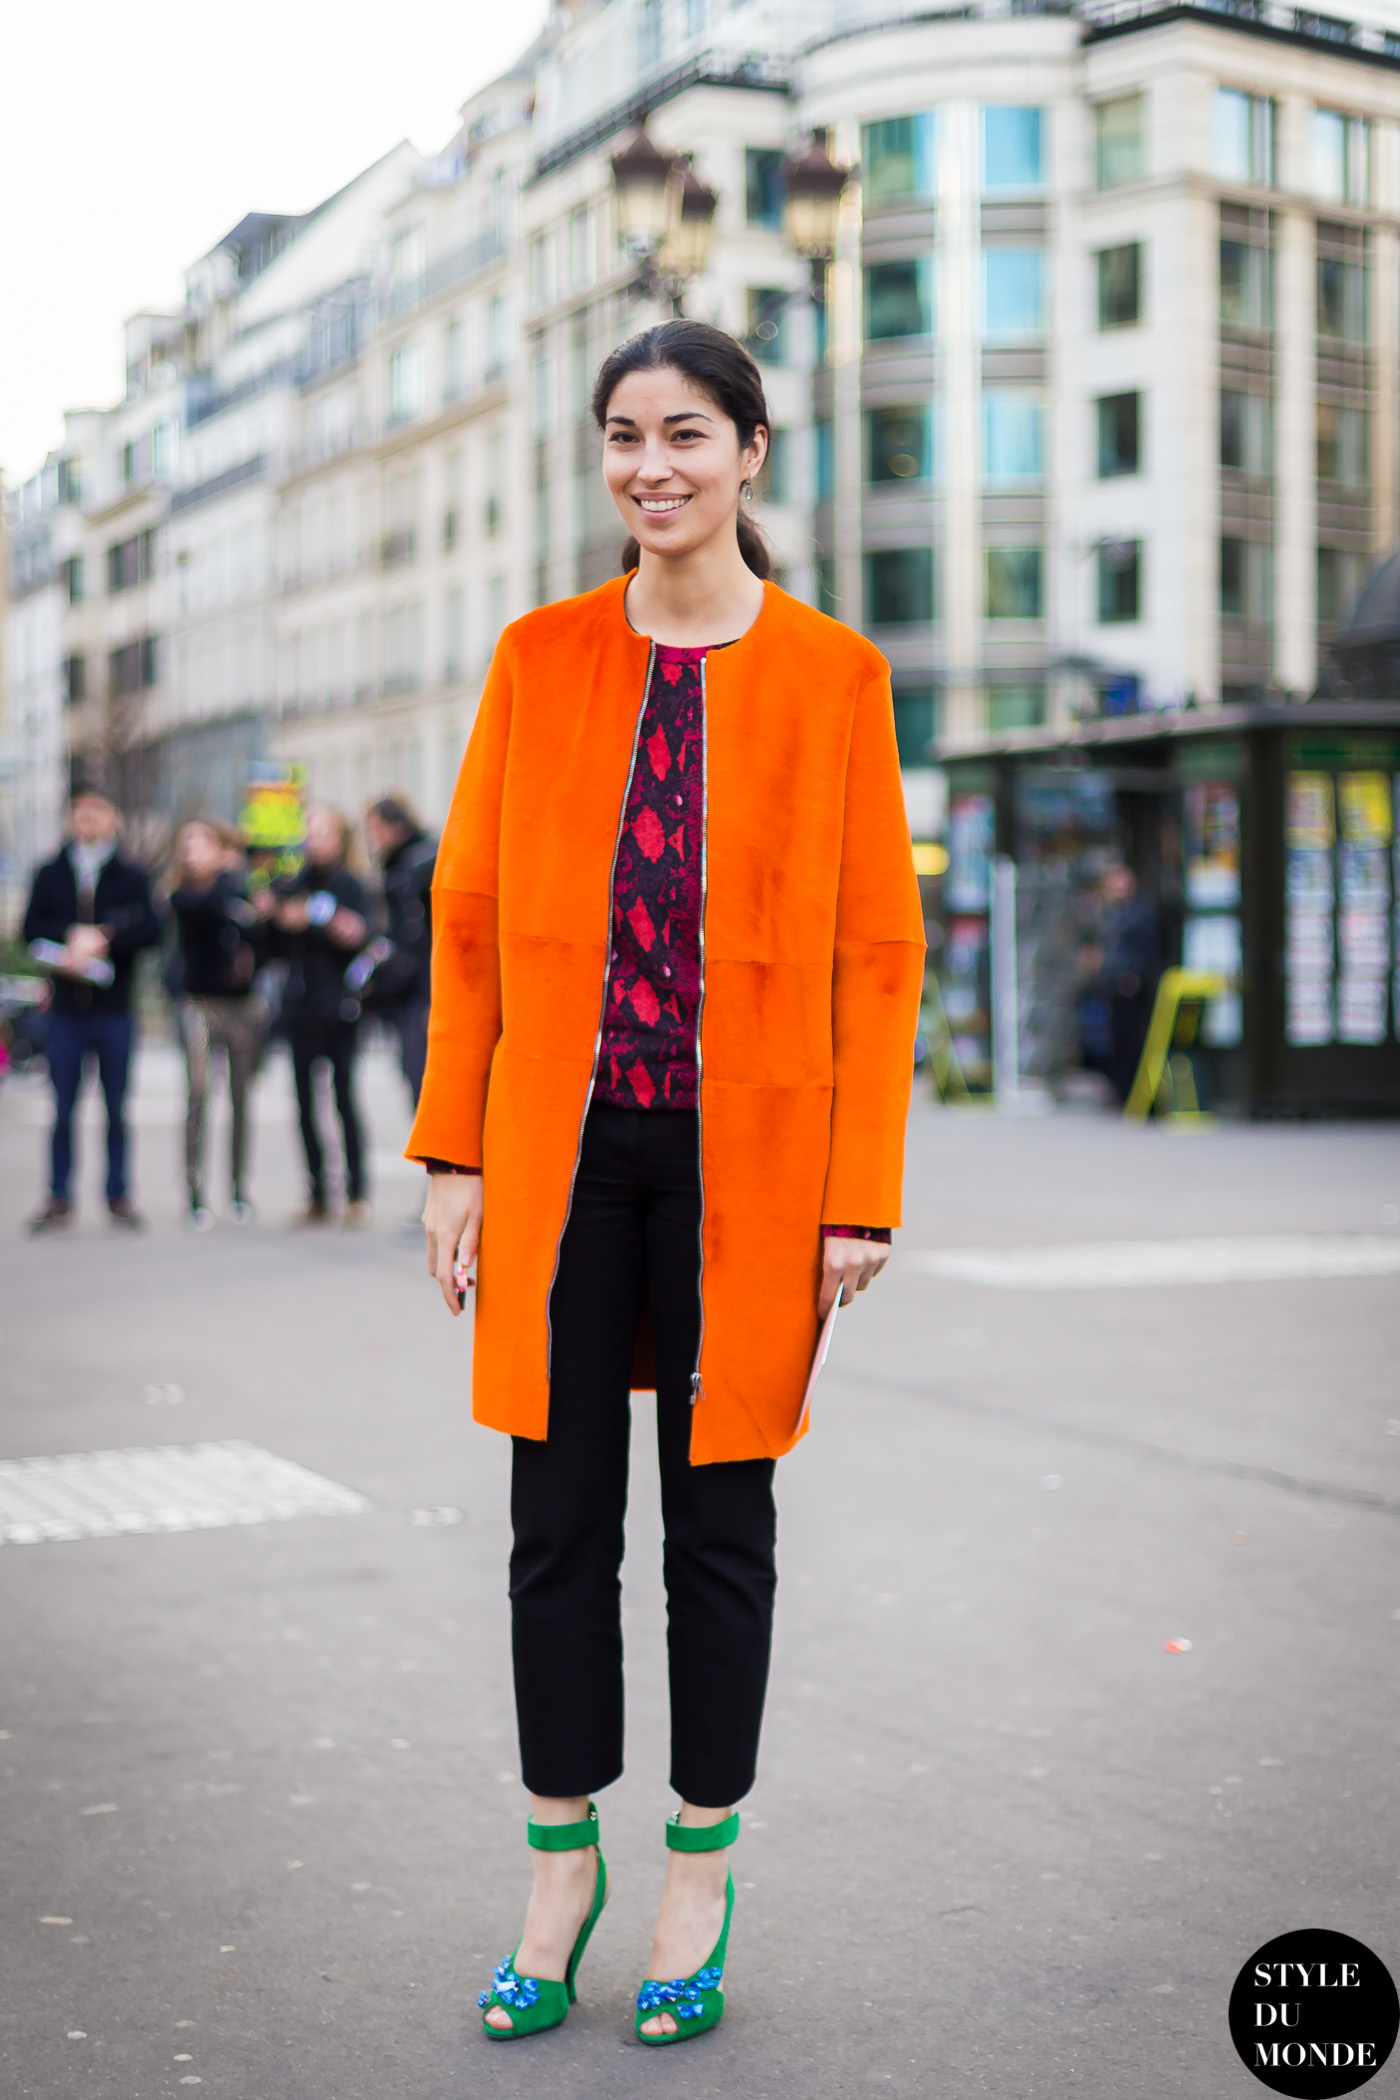 Orange coat - STYLE DU MONDE   Street Style Street Fashion Photos